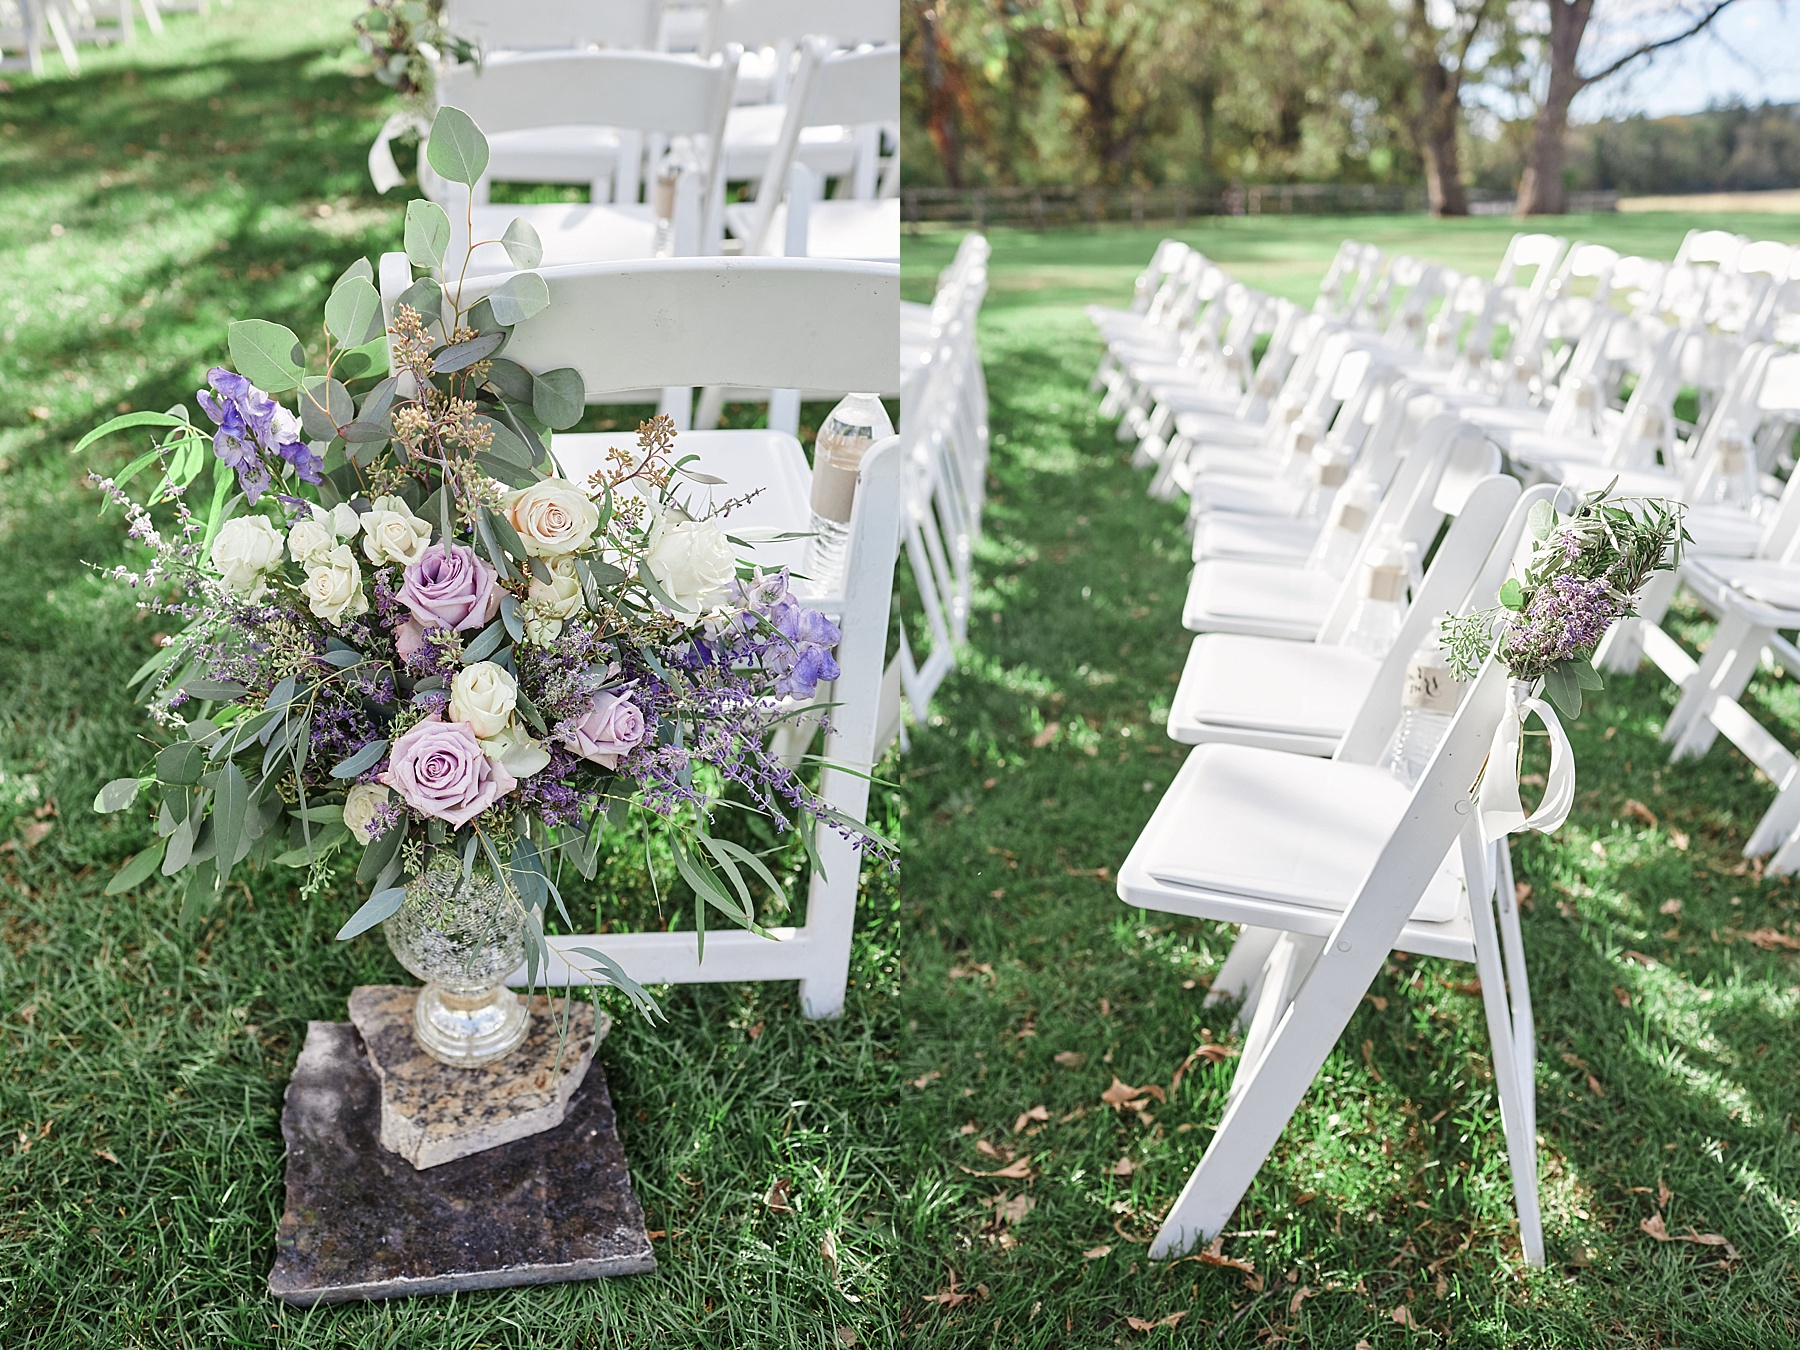 Maywood-Stone-Barn-Wedding-Rochester-Minnesota-Perry-James-Photo_0628.jpg